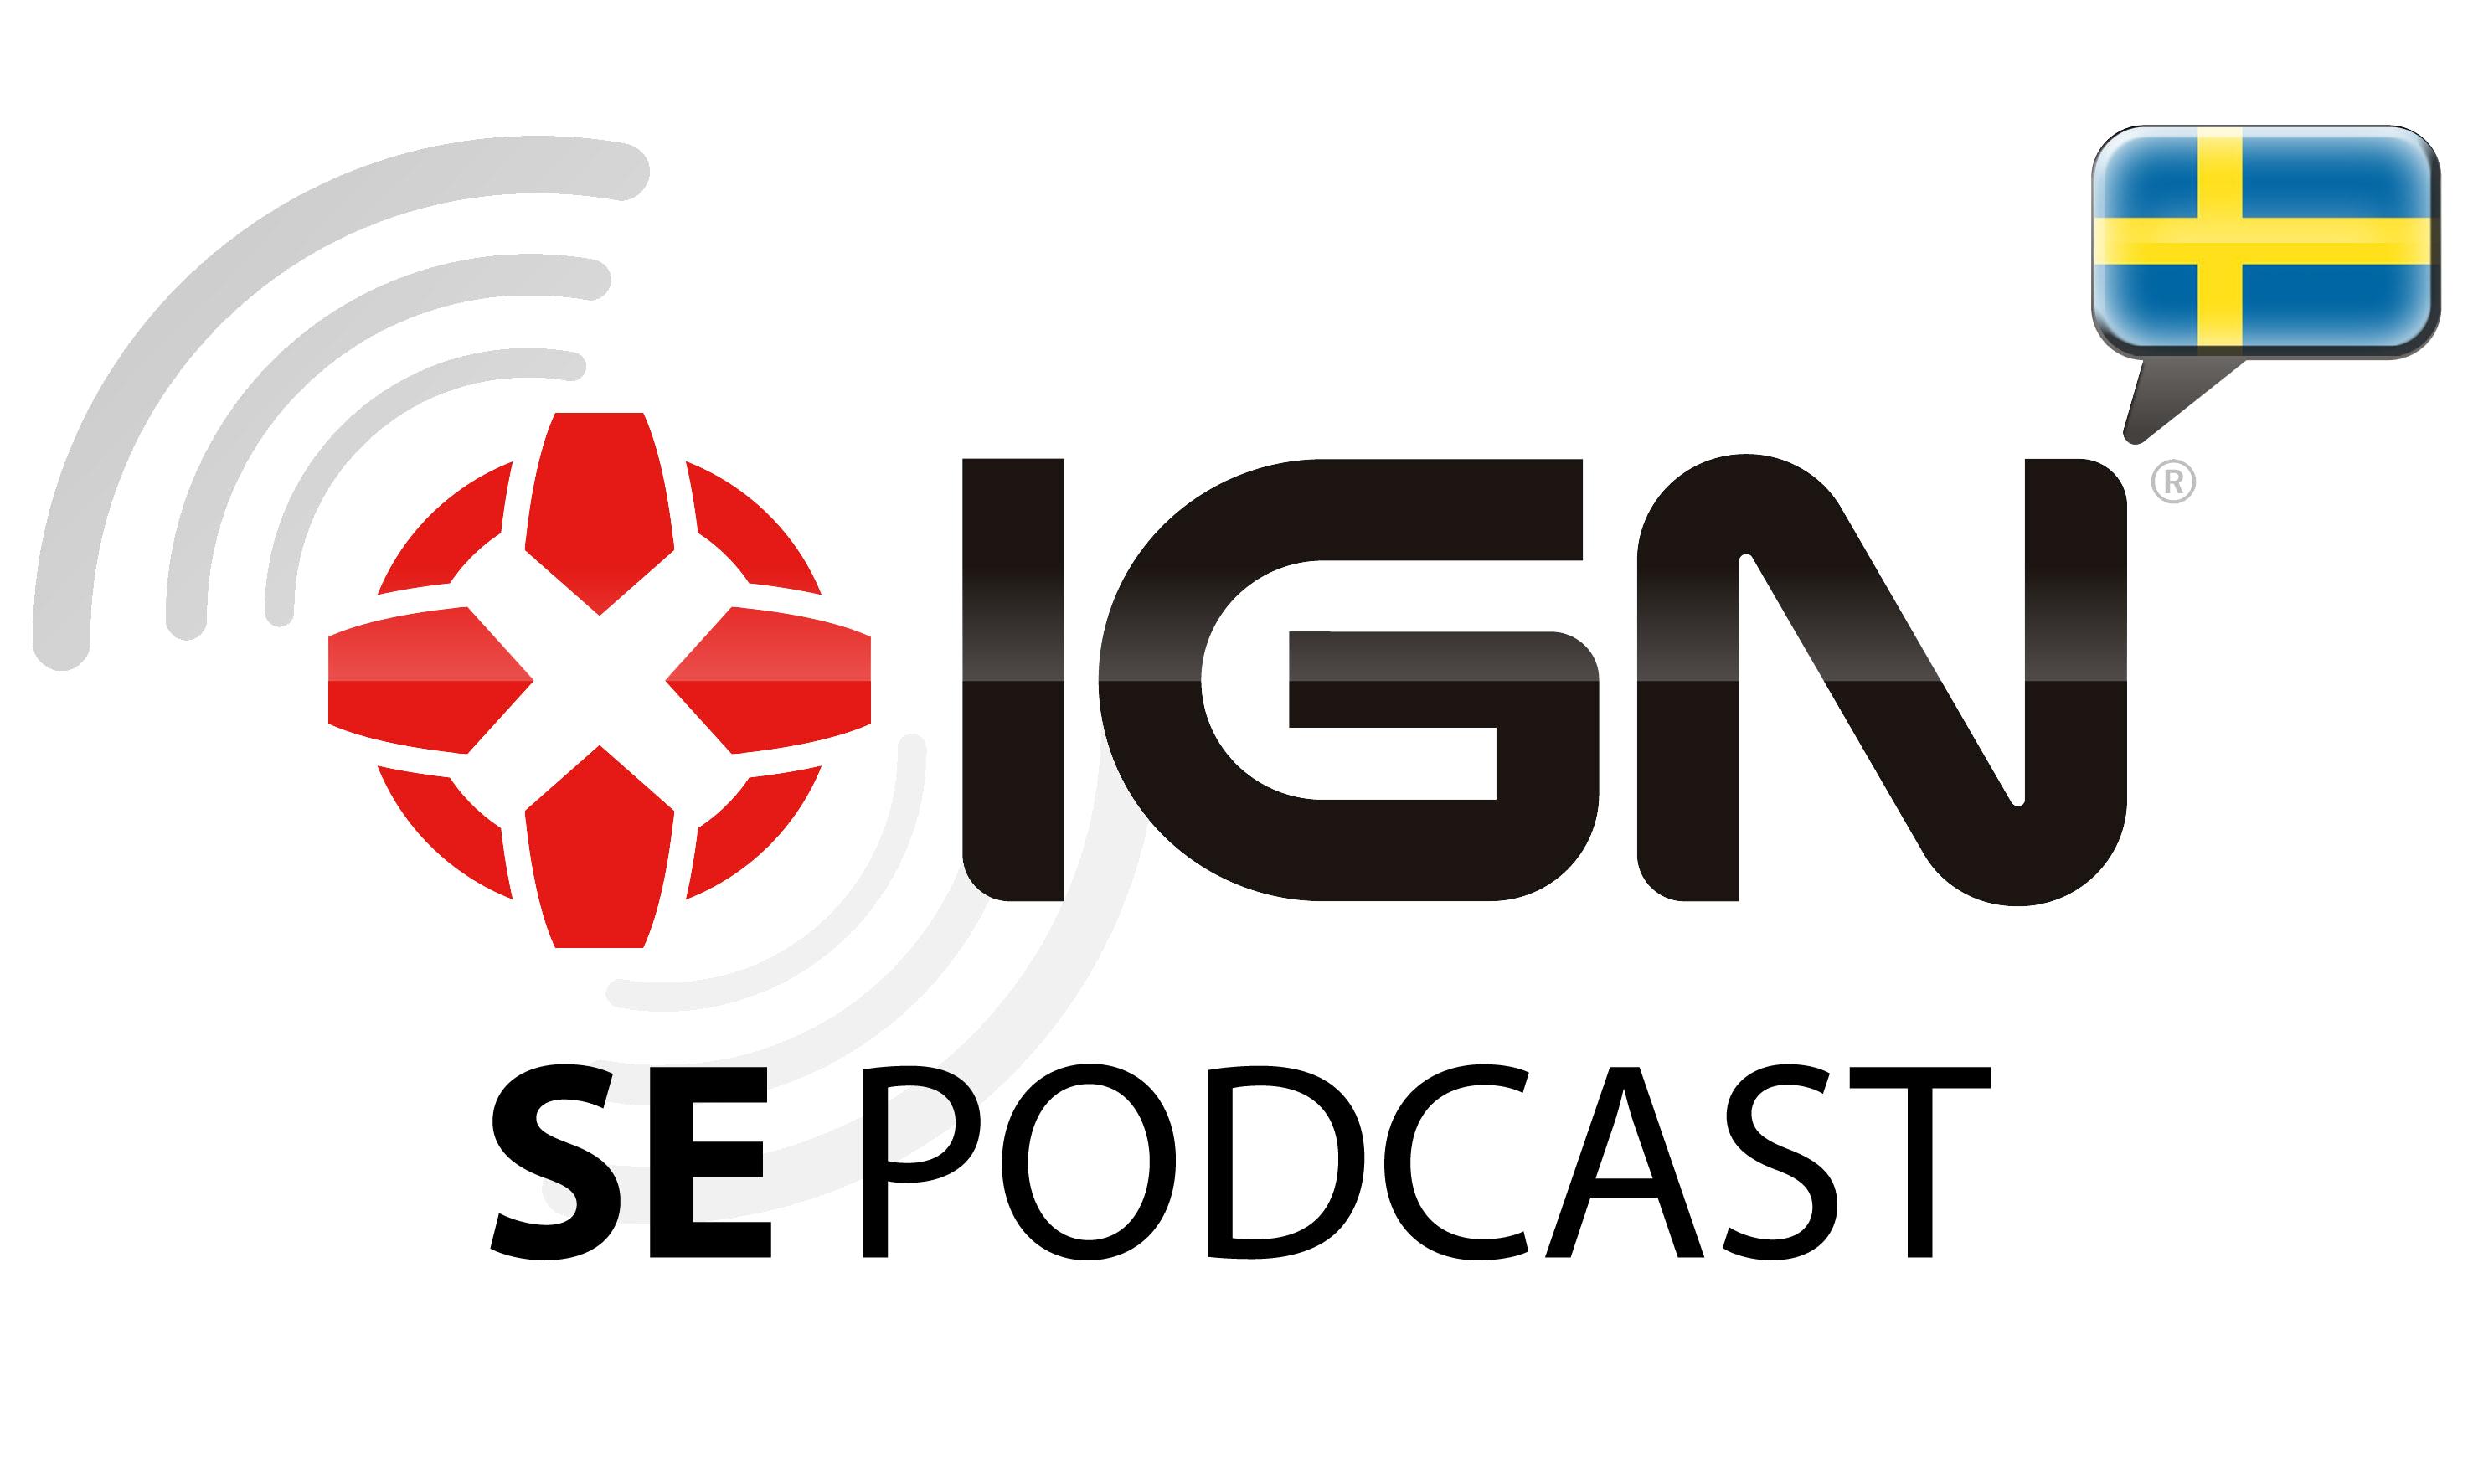 IGN Sveriges Podcast 55 - Rymdvarelserna anfaller